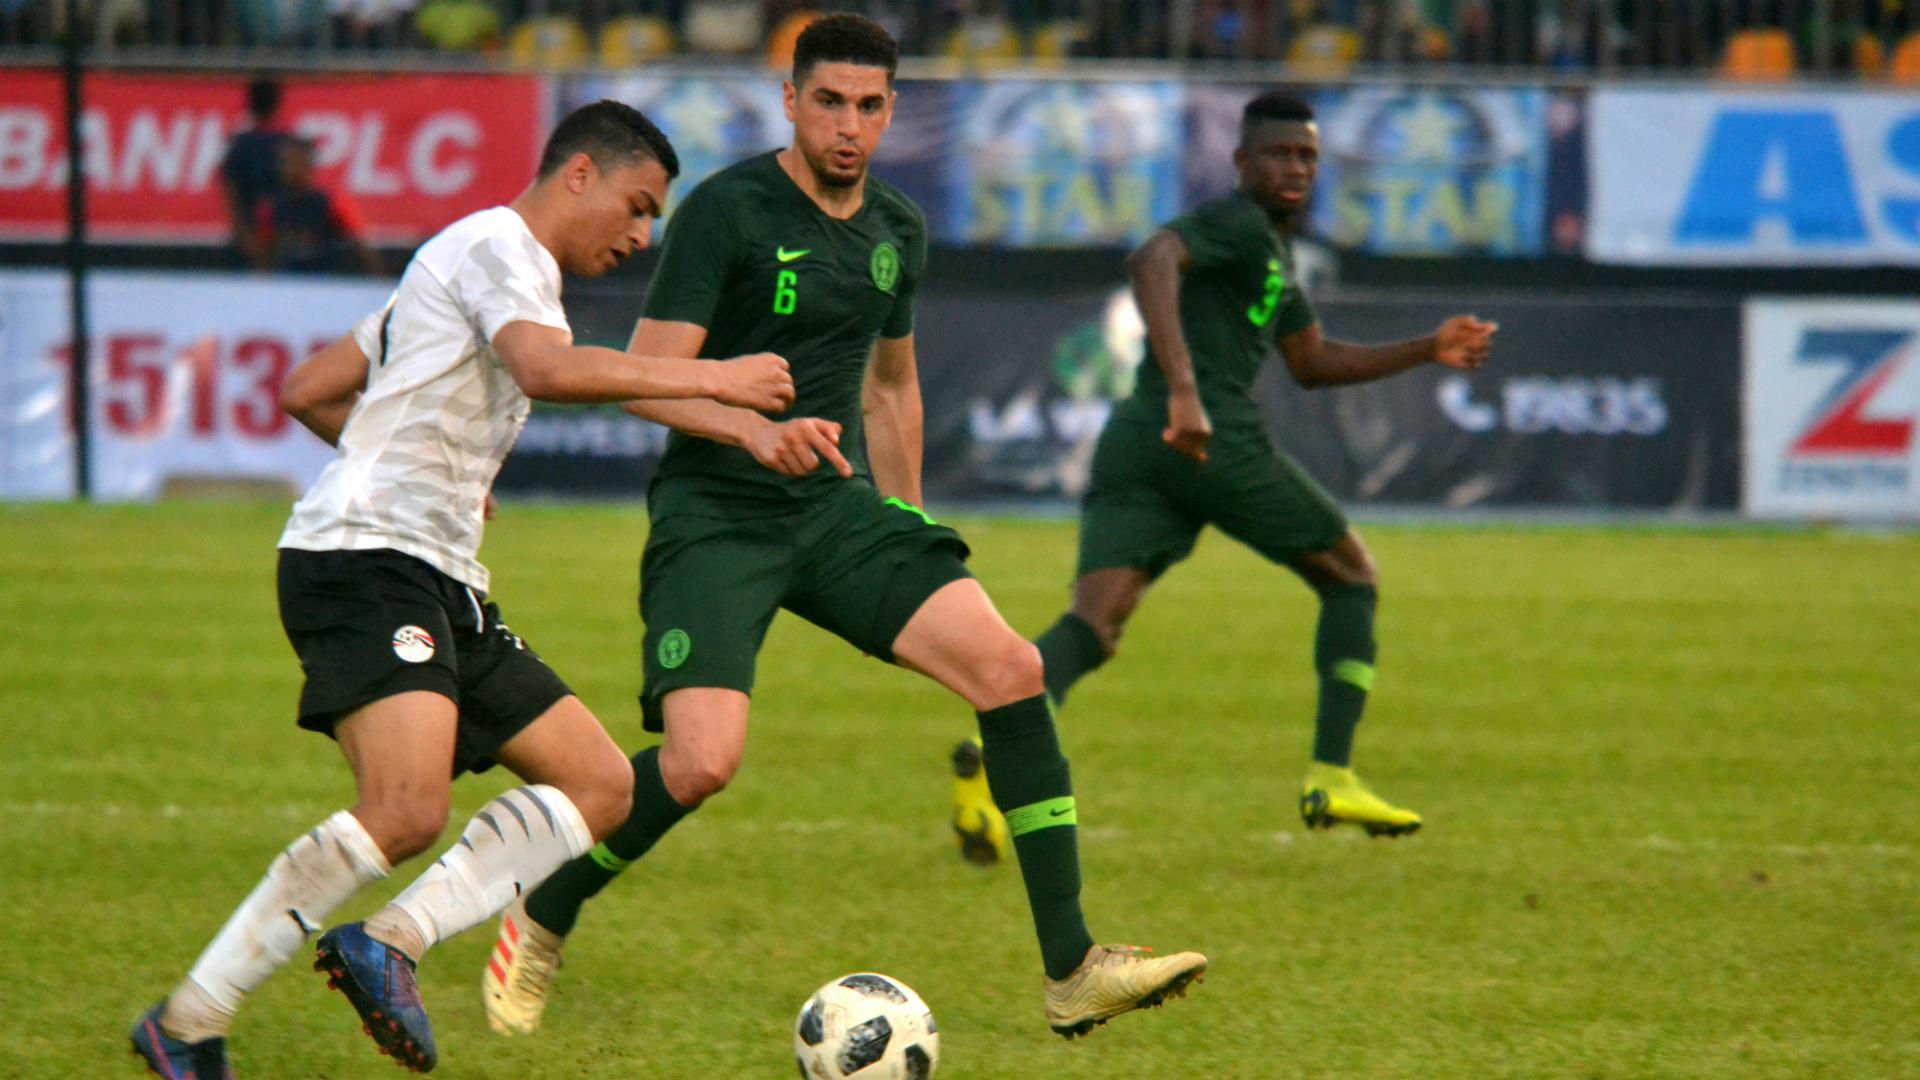 Nigeria 0-1 Algeria: What did we learn?